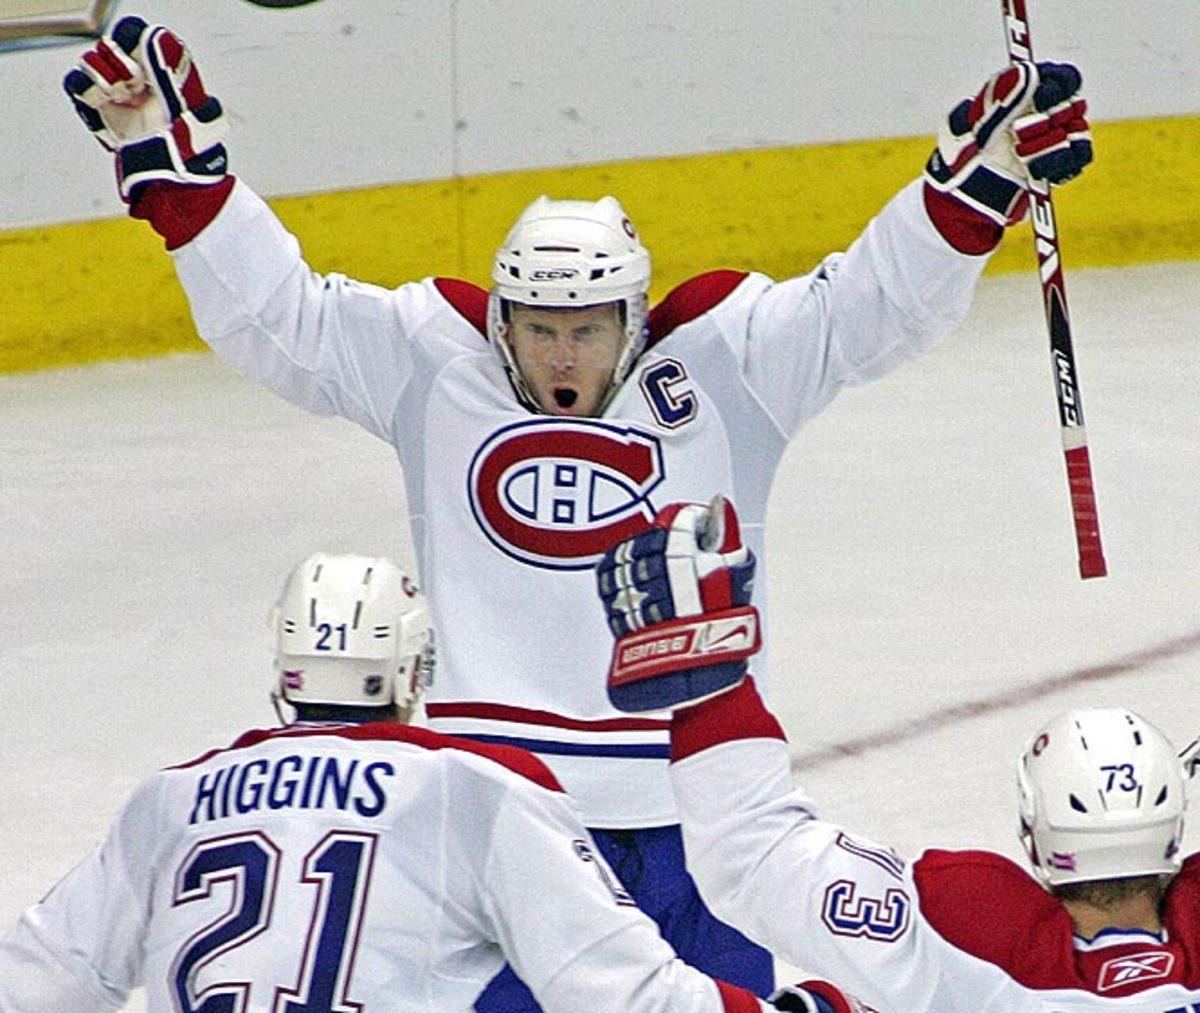 Canadiens 3, Hurricanes 2 (OT)